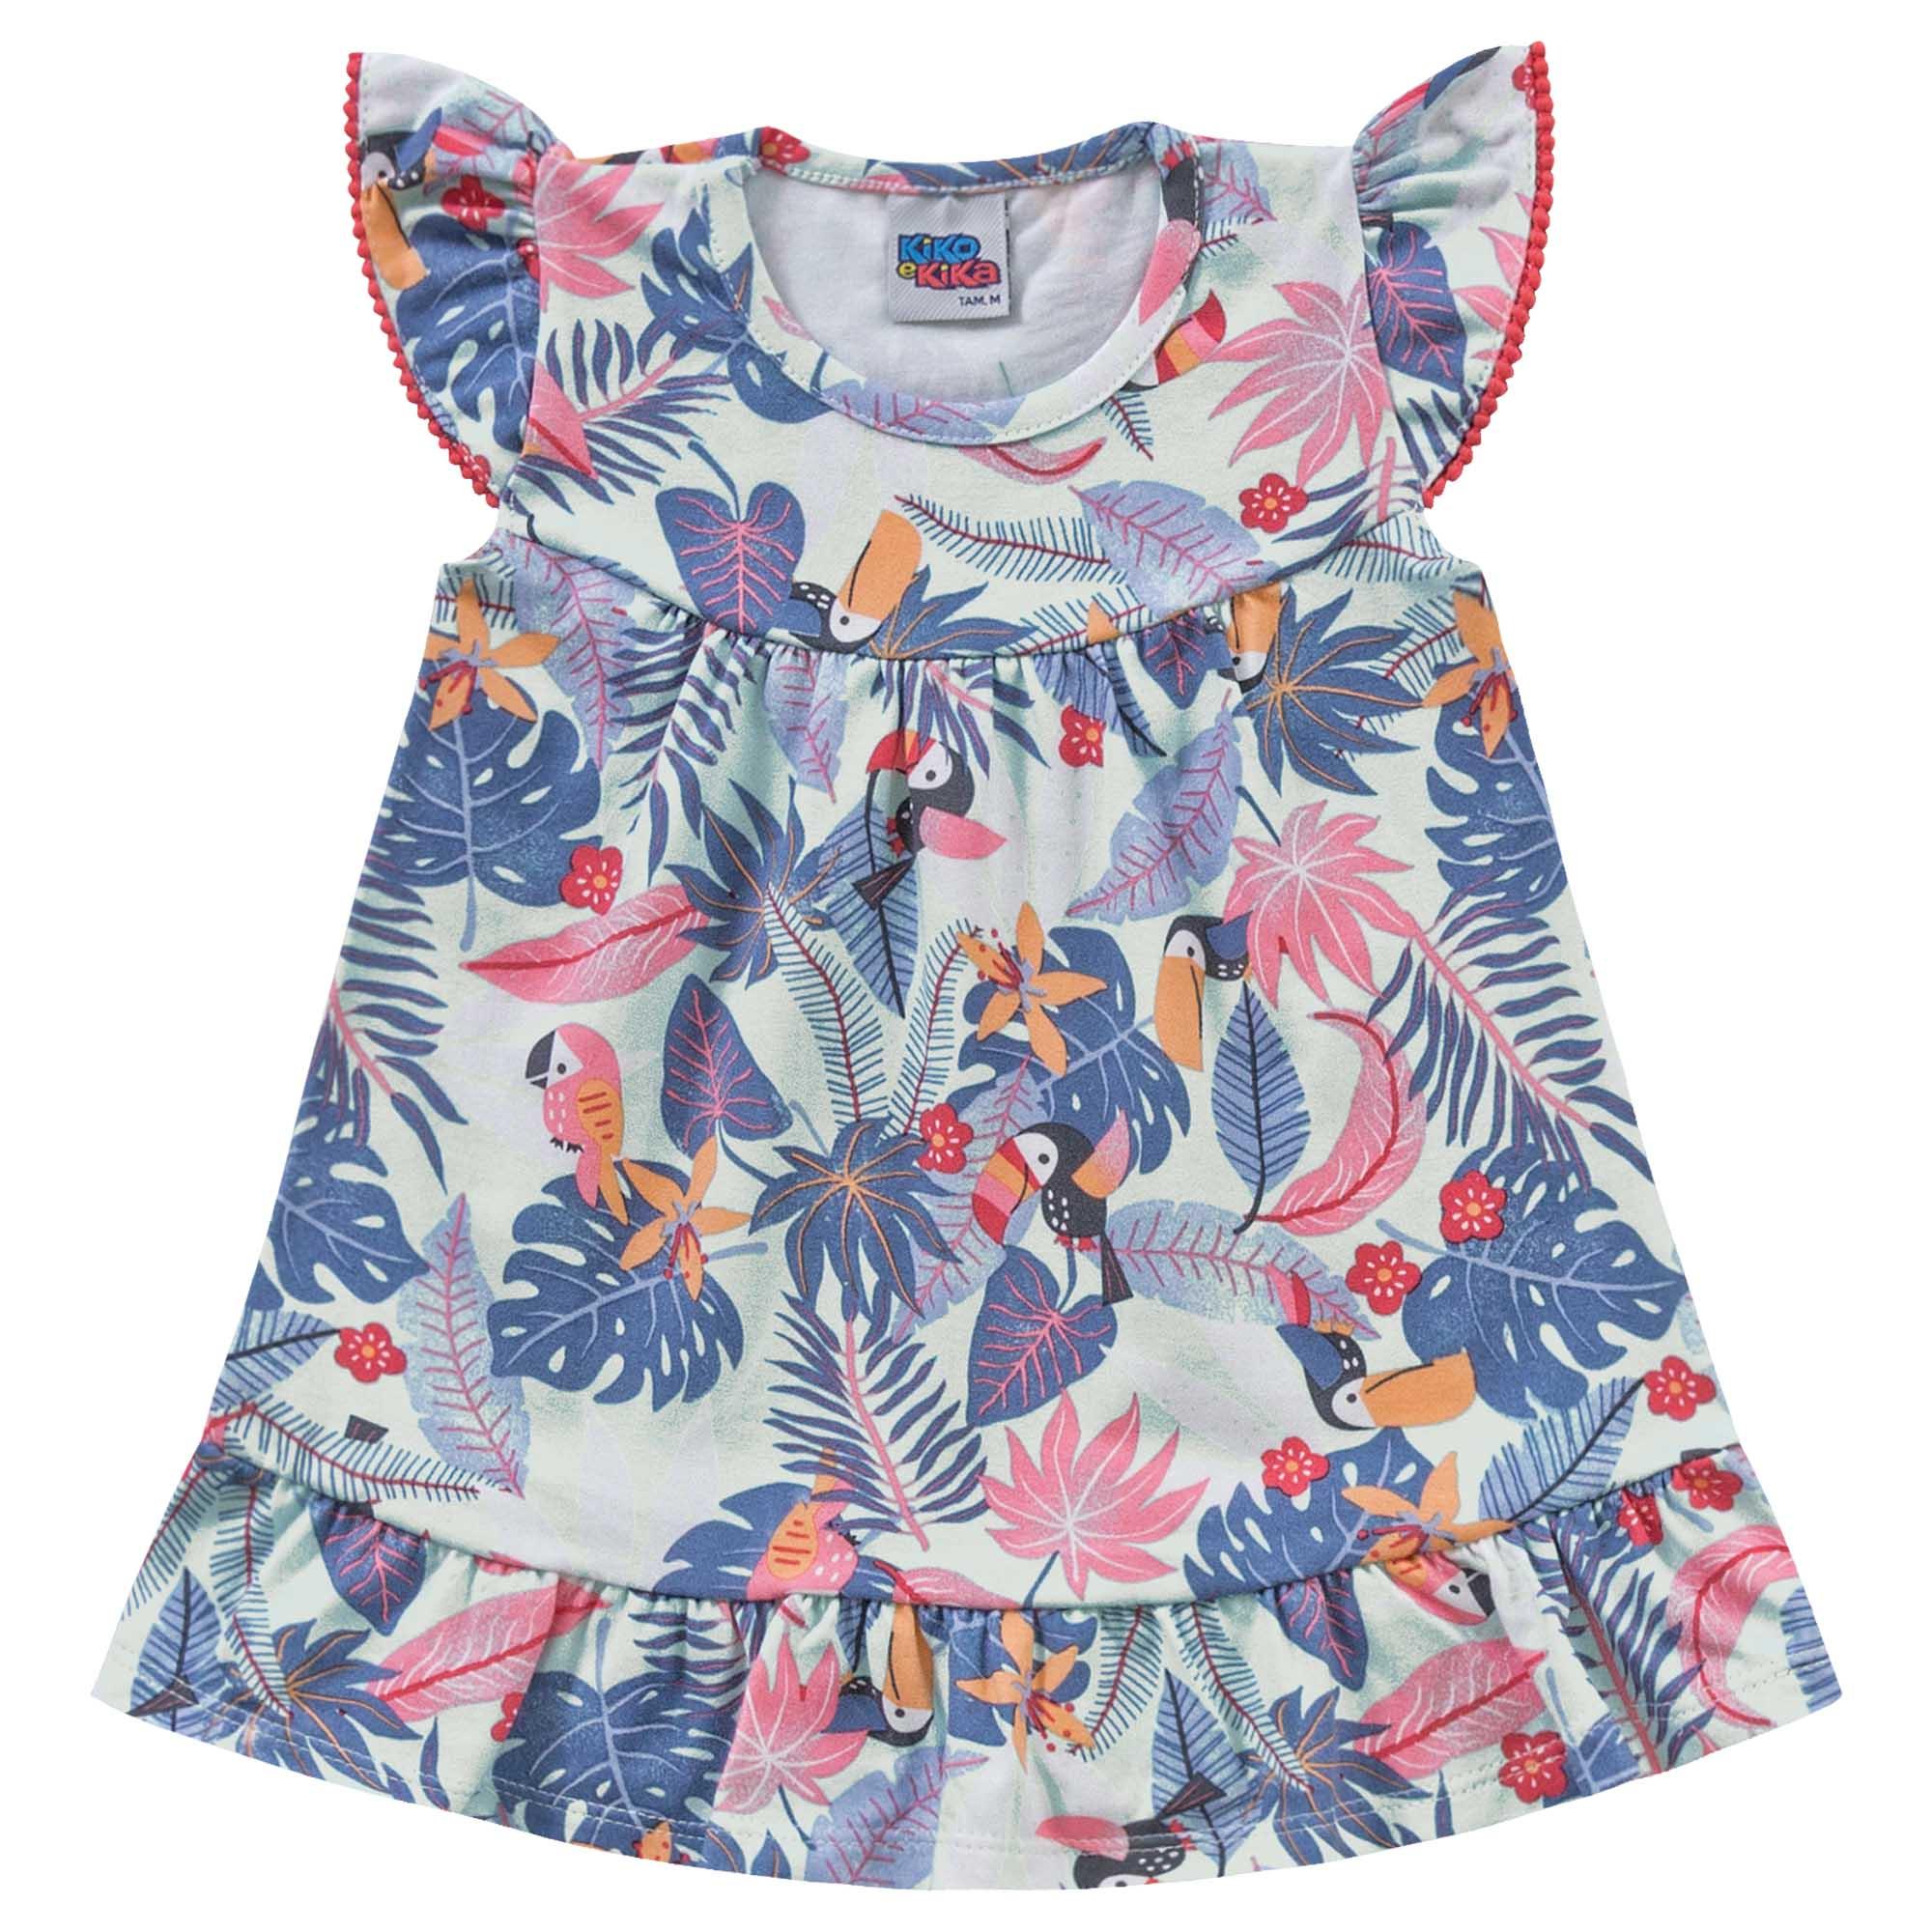 Vestido Verão Kiko e Kika Tropical - P ao G